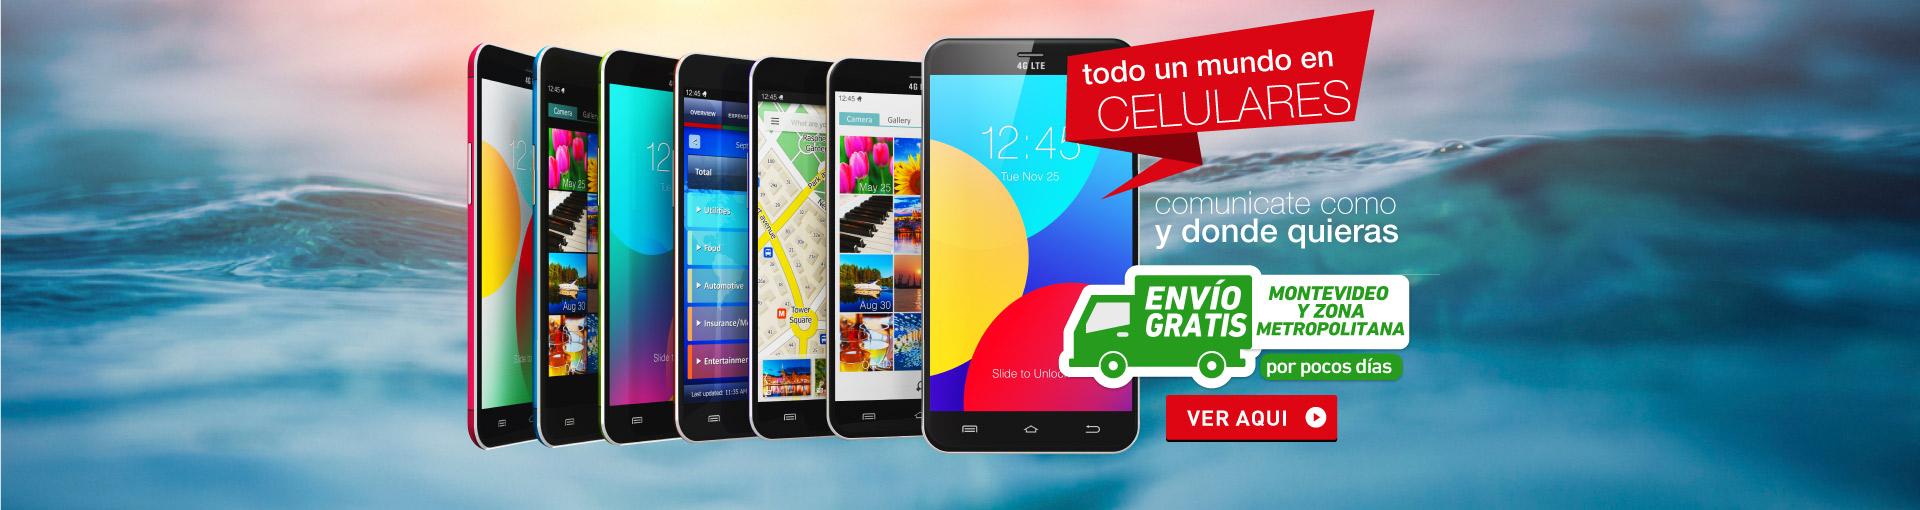 h-celulares-envío-gratis